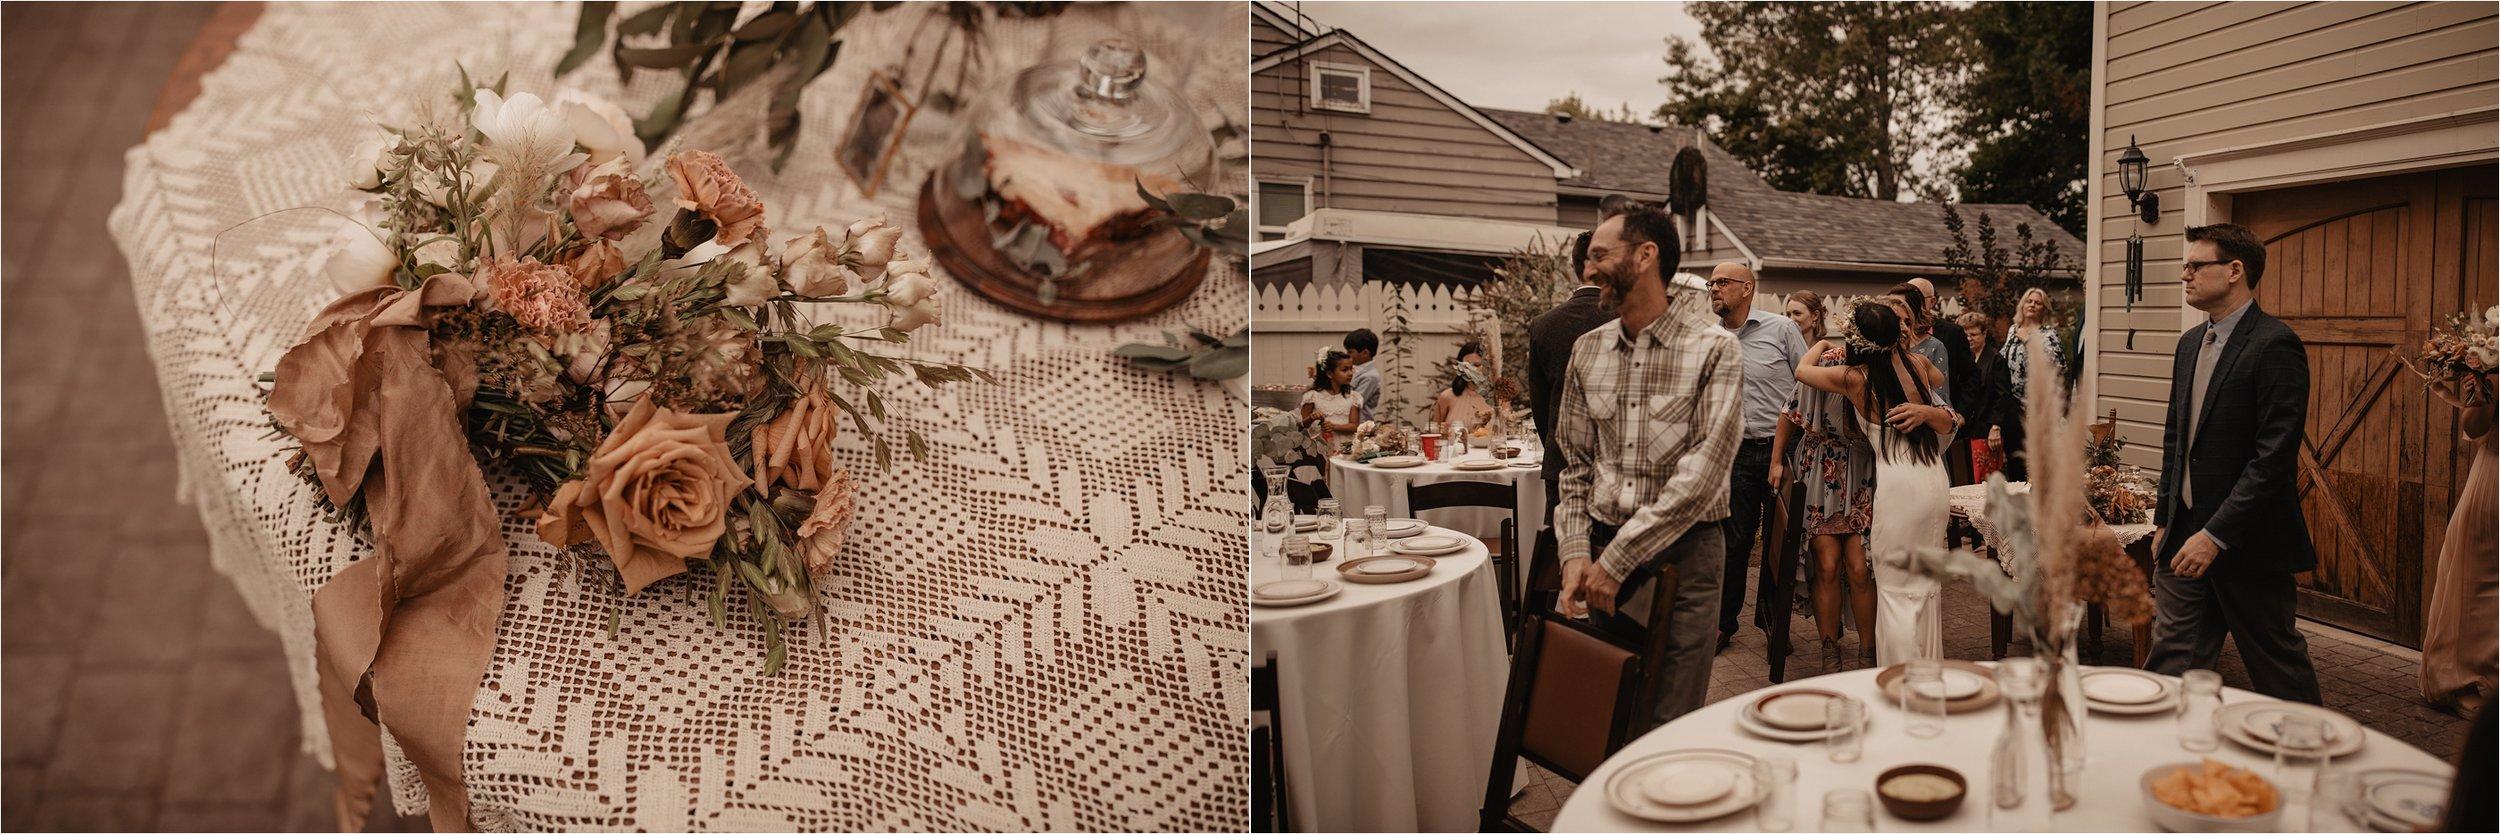 intimate-portland-modern-trendy-wedding_0087.jpg